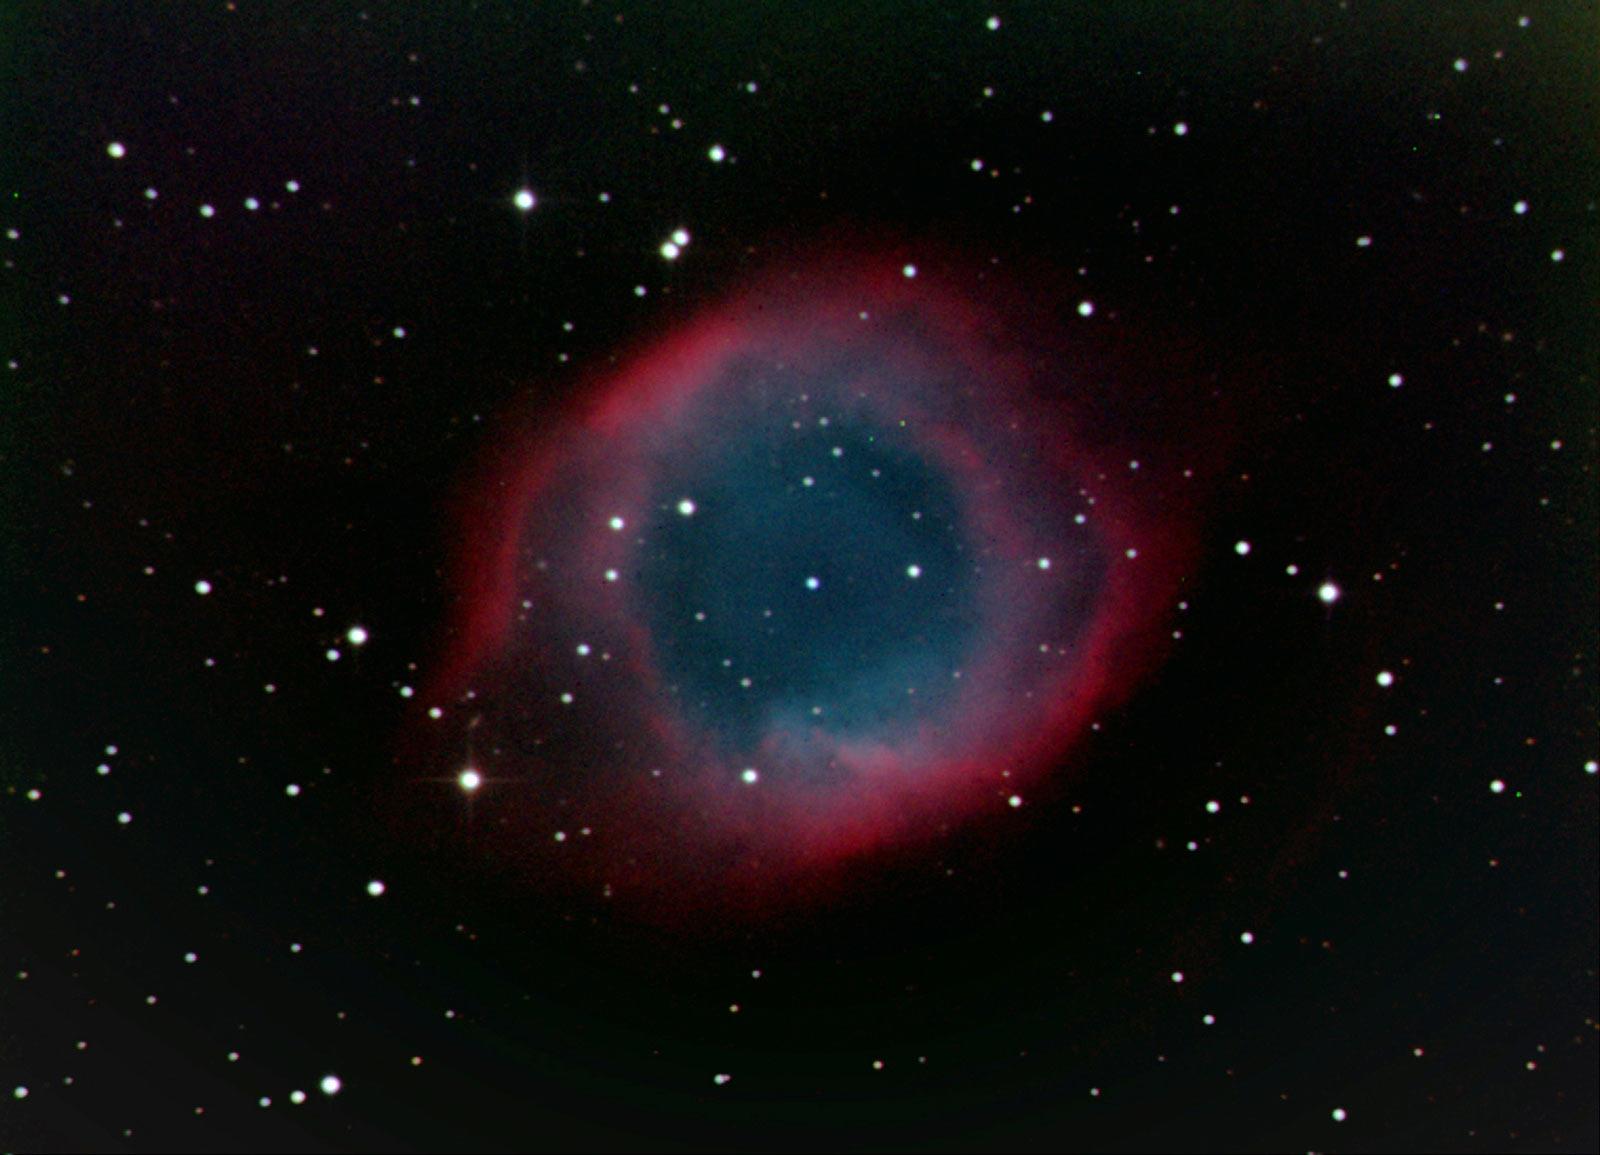 helix nebula constellation aquarius-#4